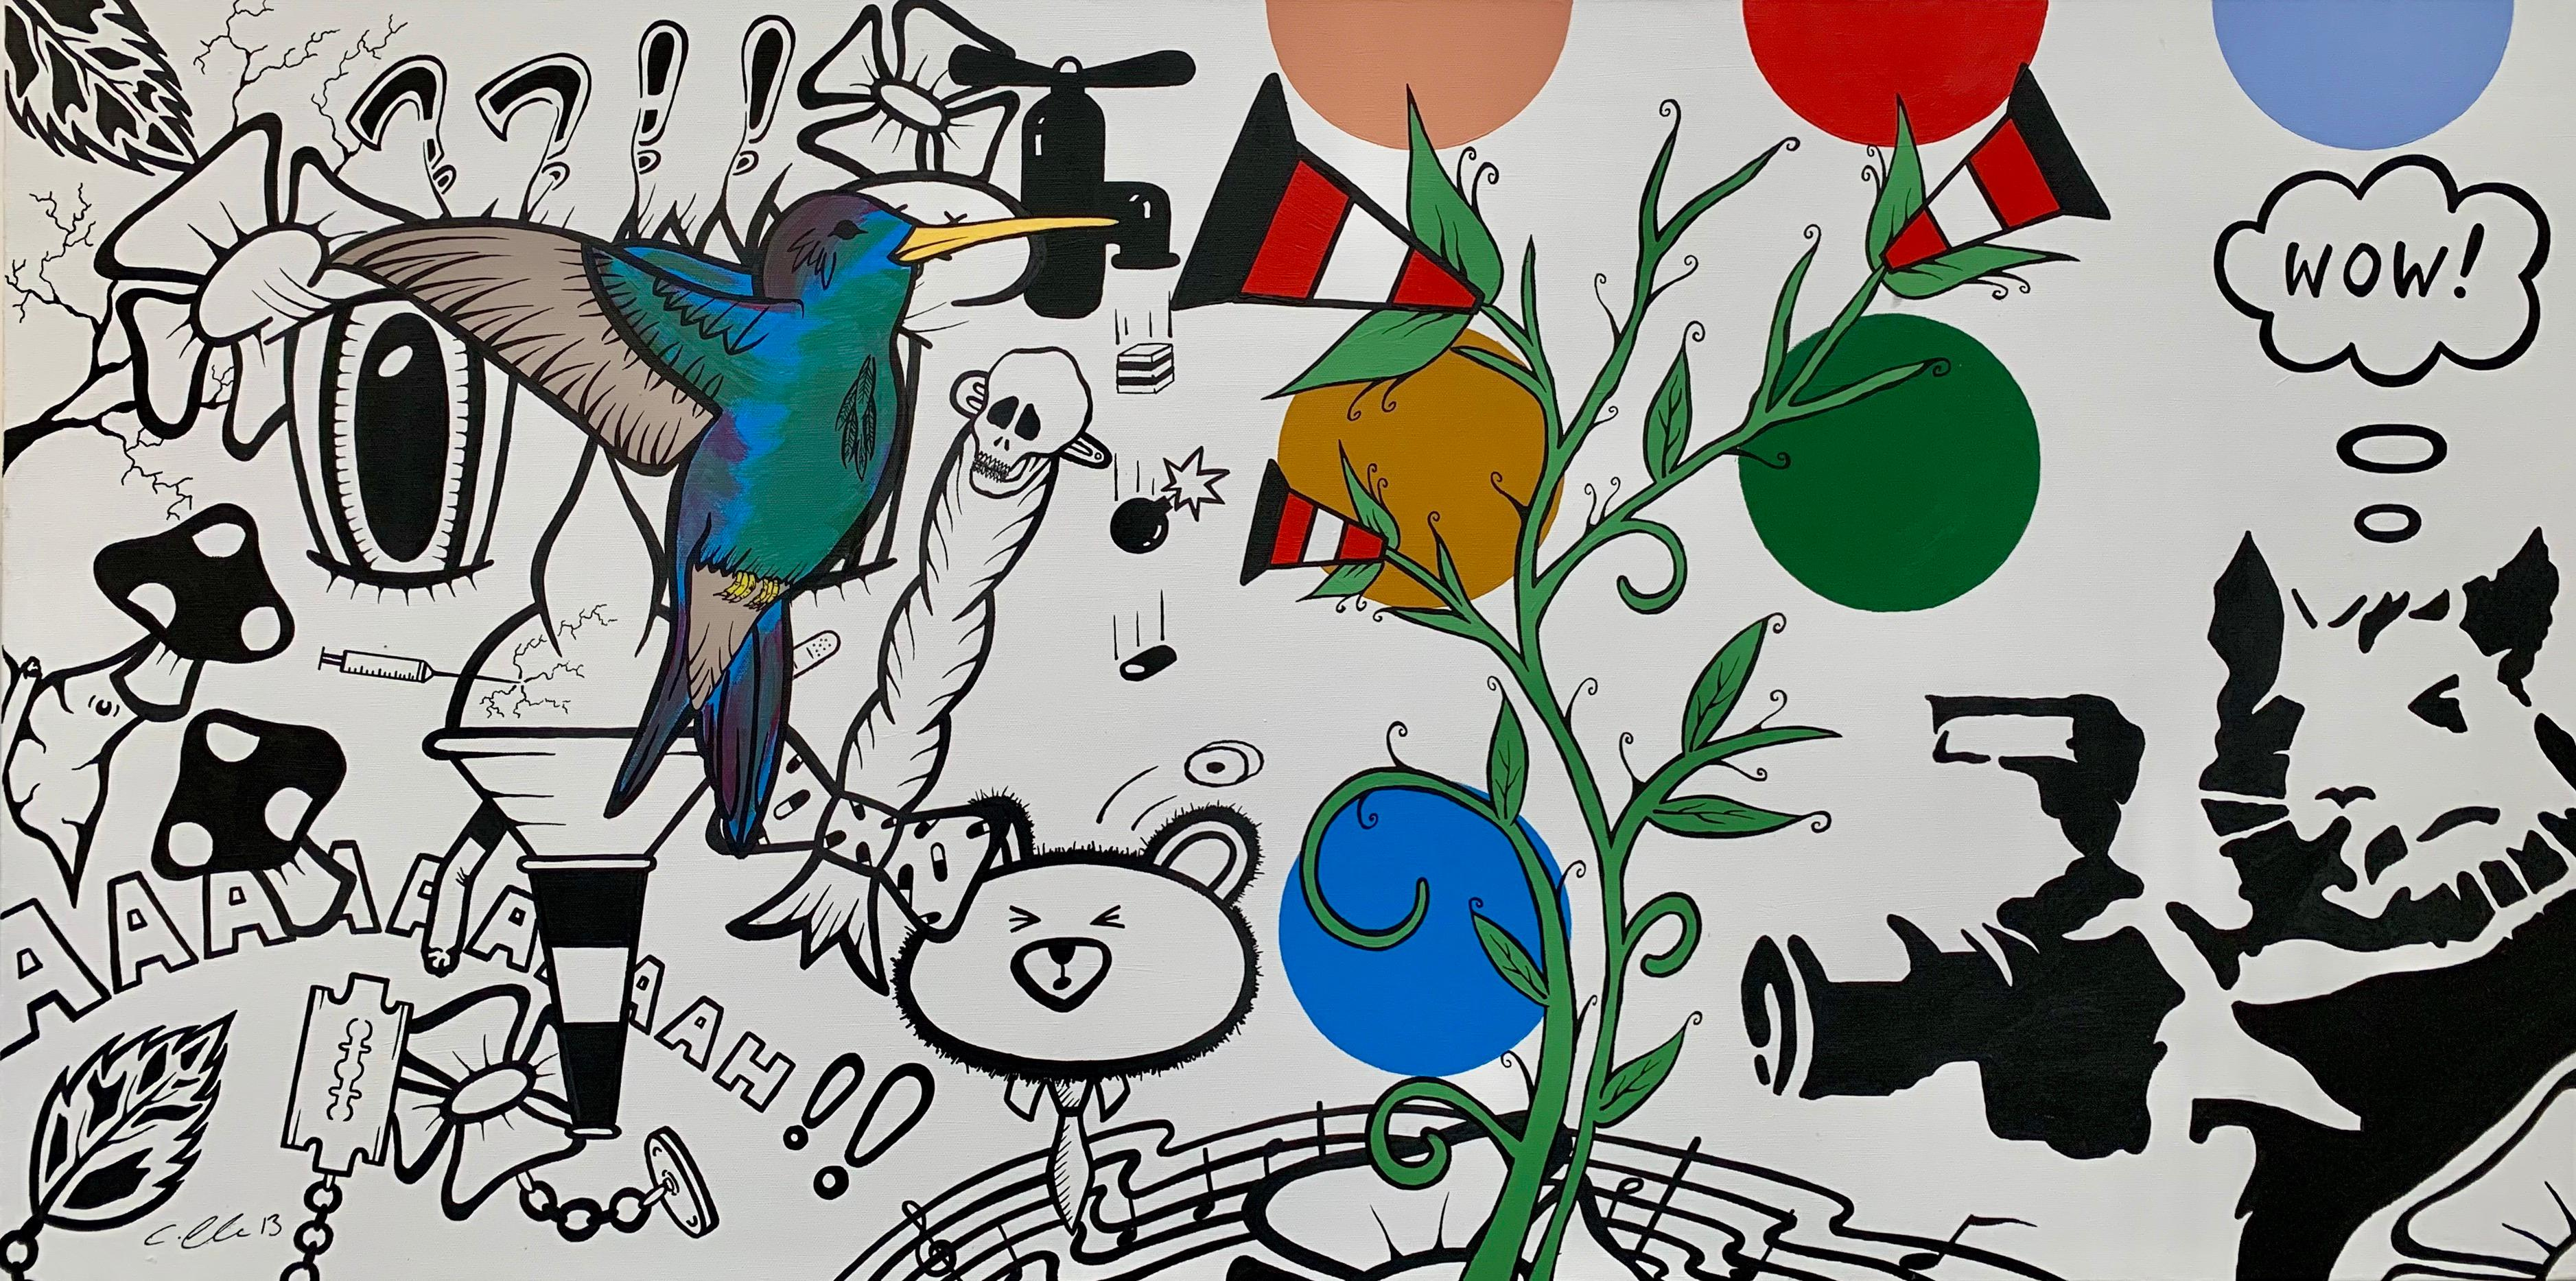 Urban Graffiti Cartoon Manga Pop Art by British Street Artist Chris Pegg